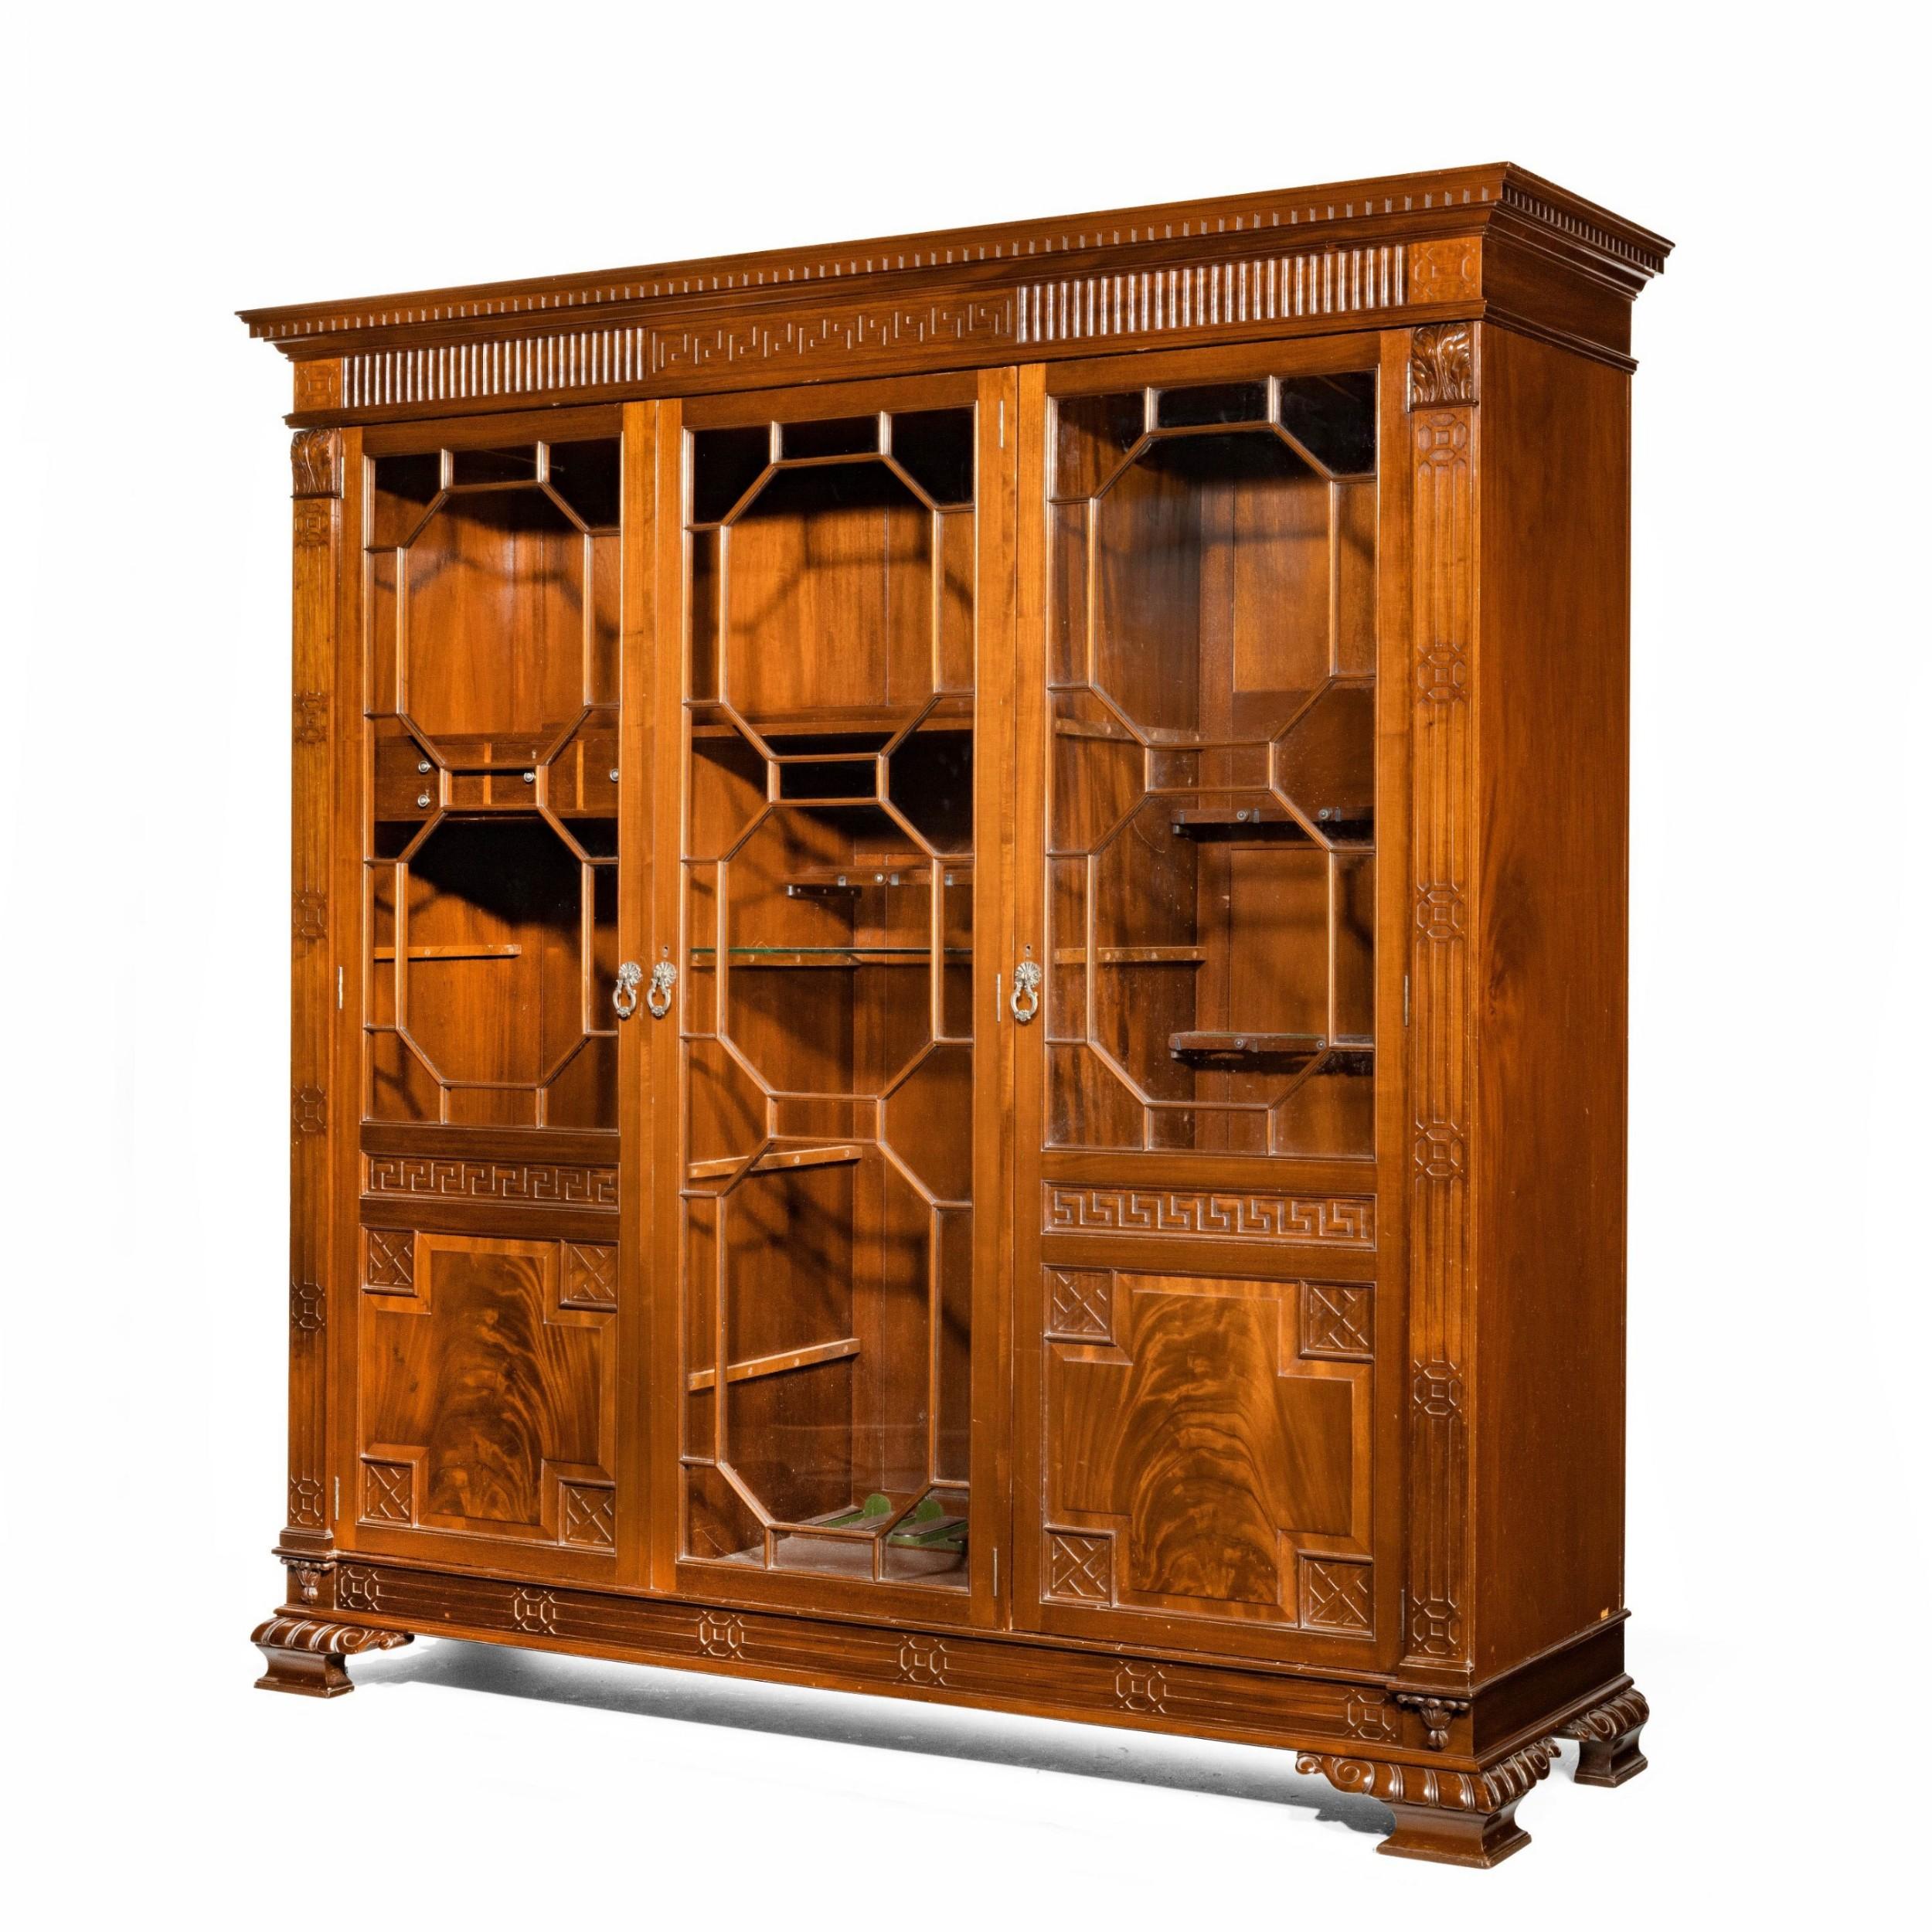 a early 20th century mahogany gun display cabinet